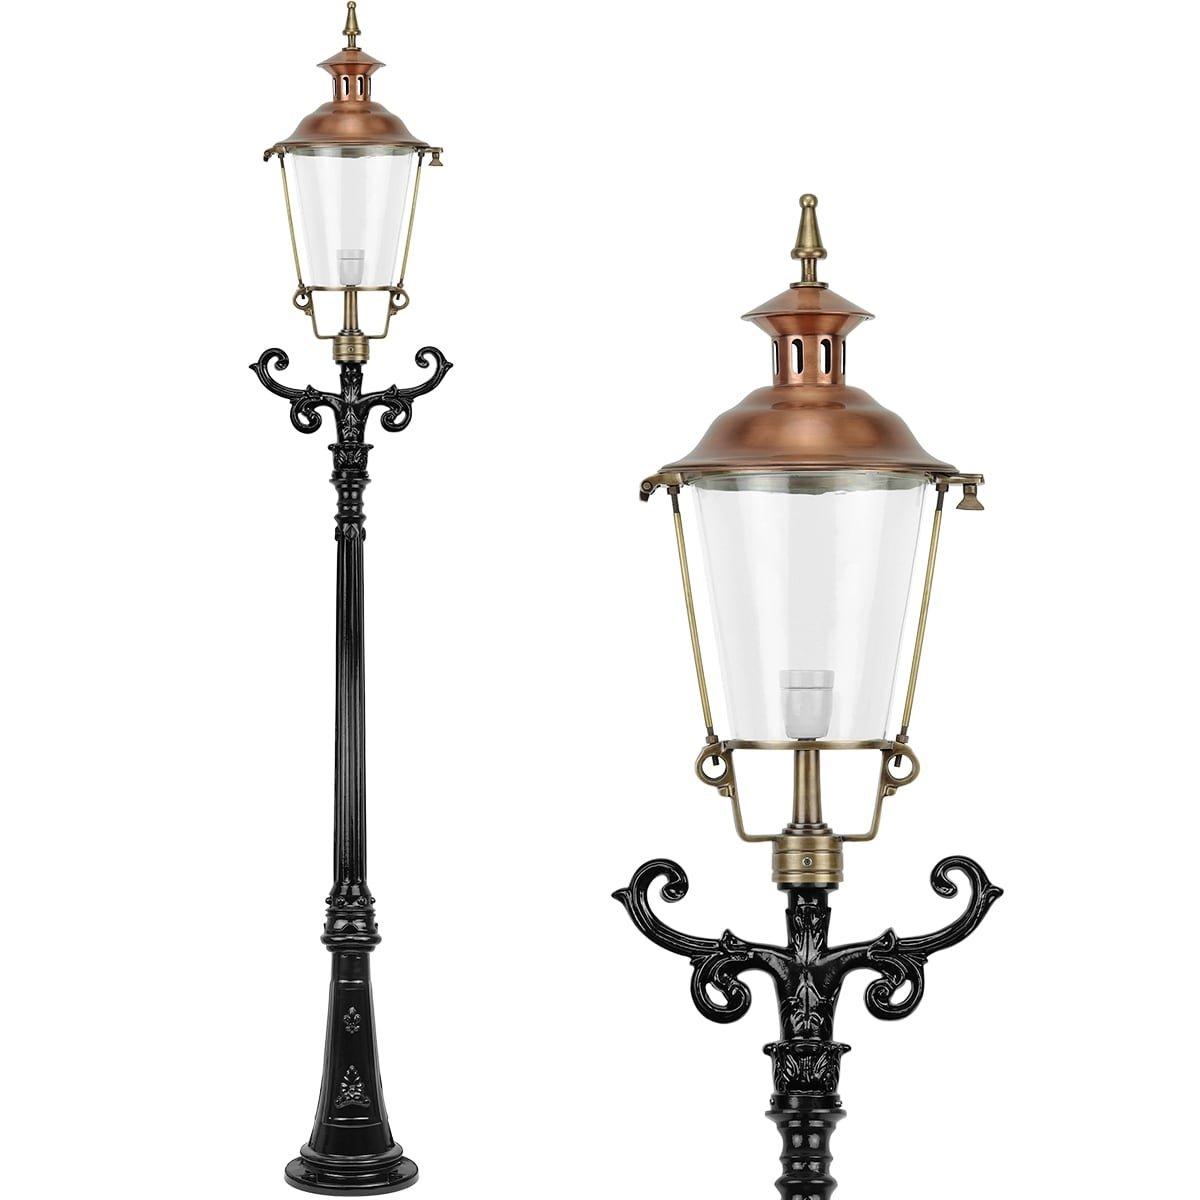 Outdoor Lighting Classic Rural Lantern ladder support Metslawier - 280 cm